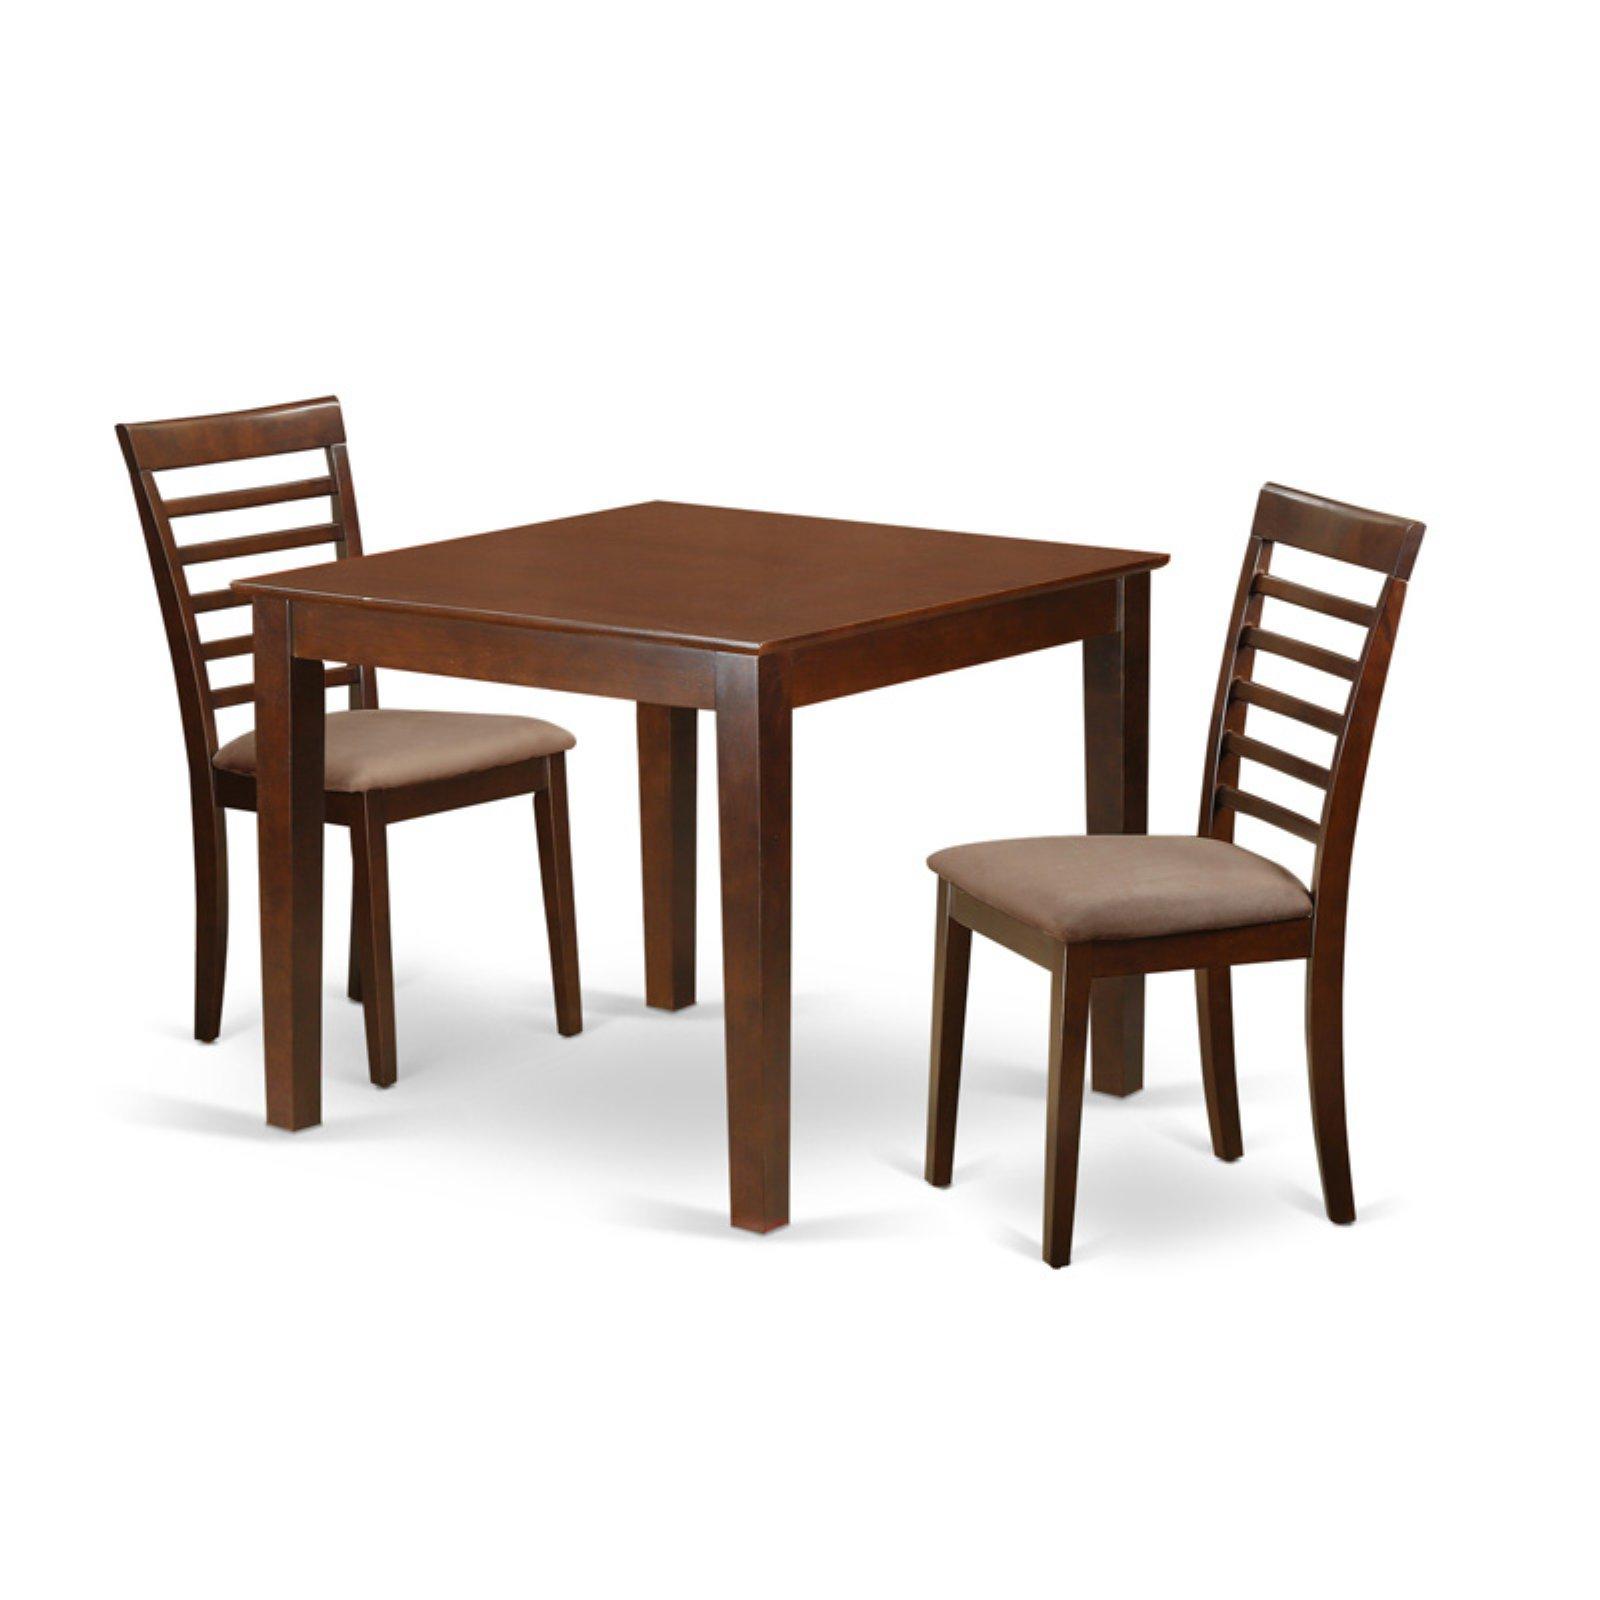 Recent Smyrna 3 Piece Dining Sets inside East West Furniture 3 Piece Straight Ladderback Breakfast Nook